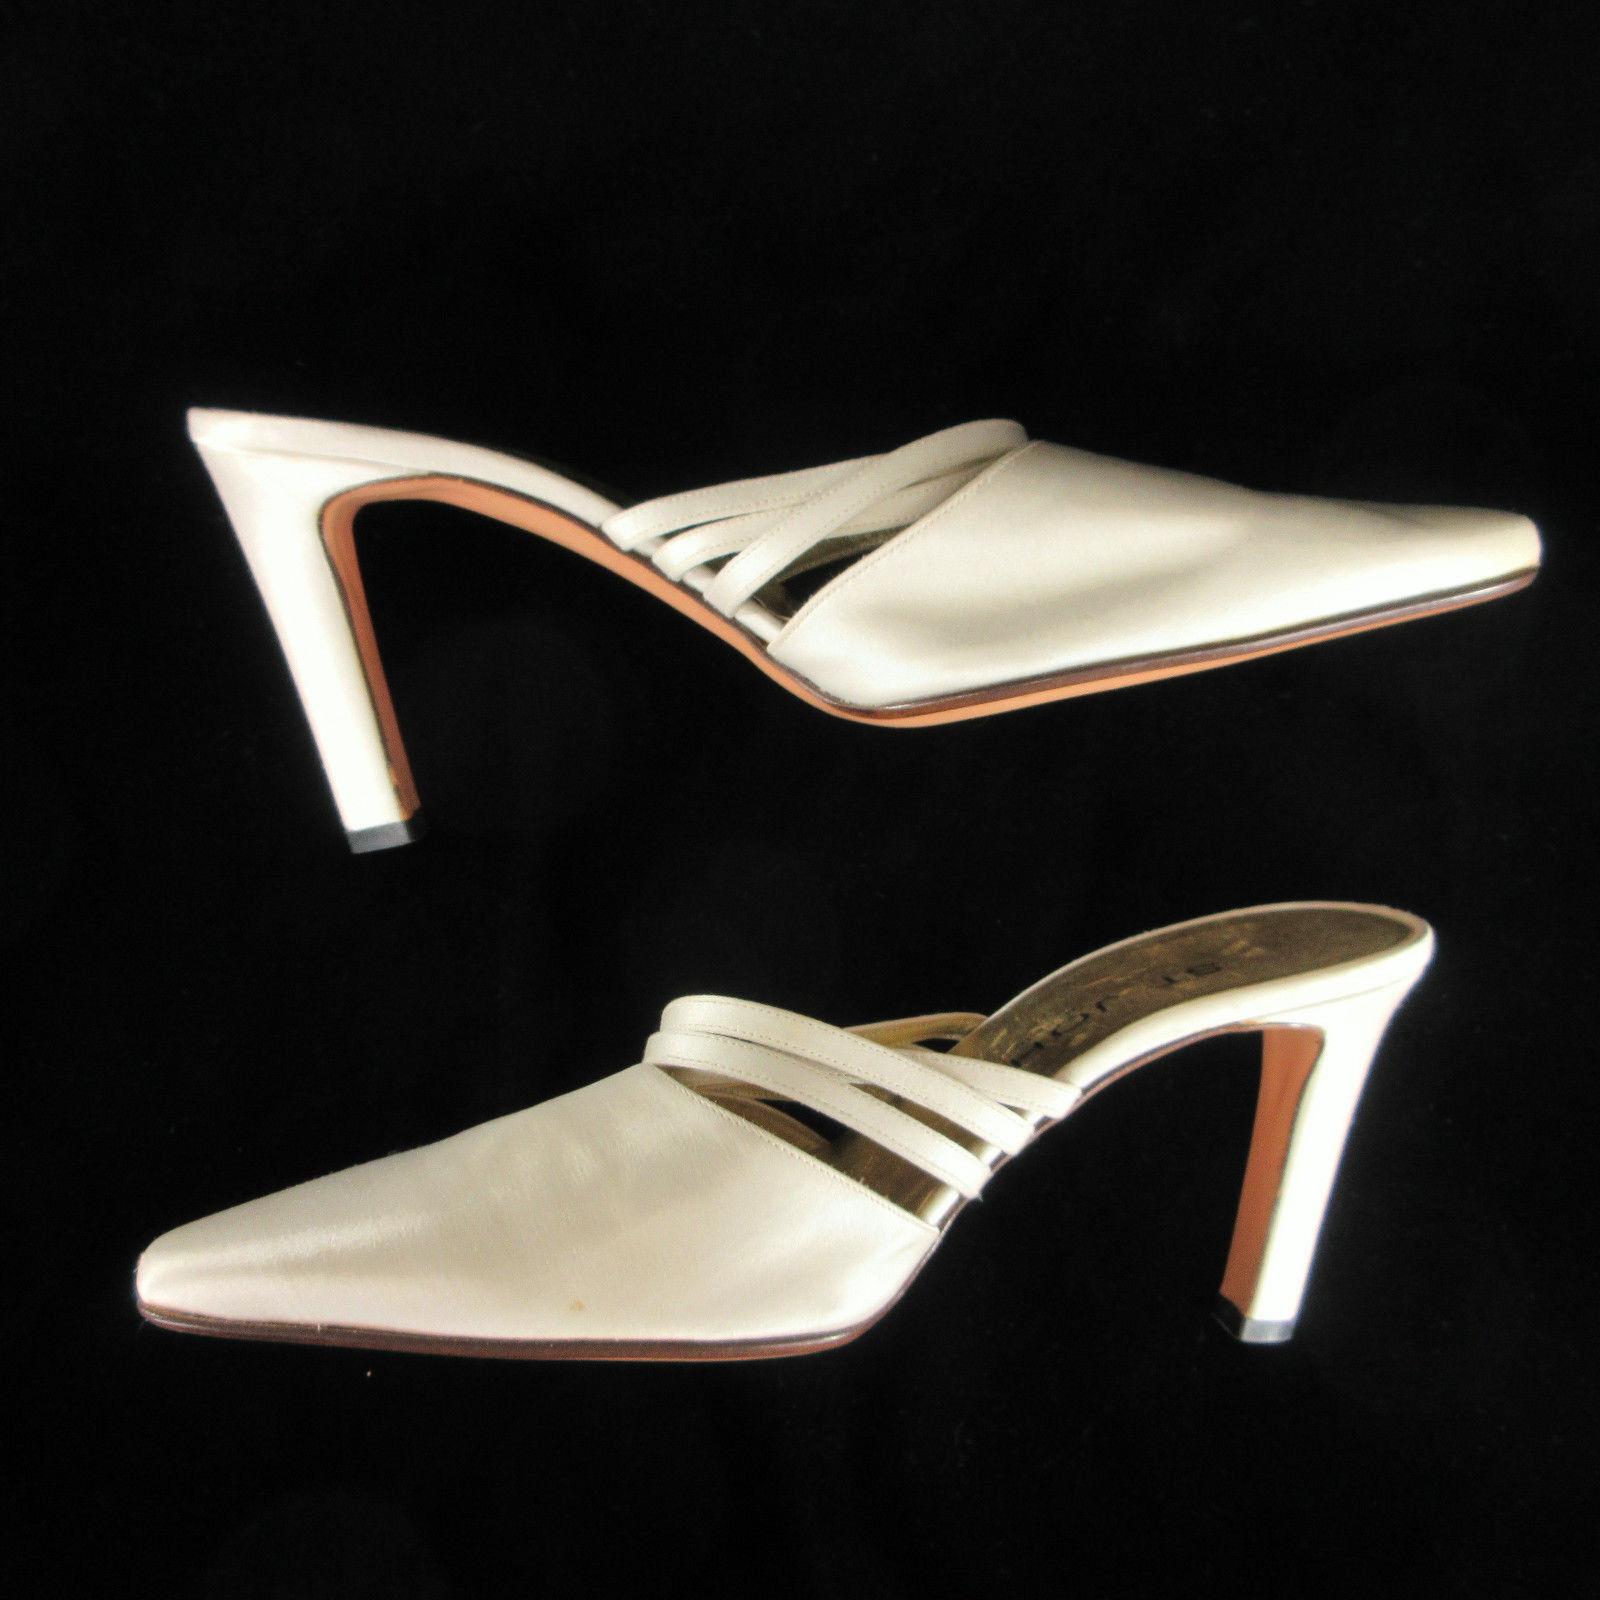 St John Damenschuhe HIgh Heels 9 Ivory Satin Strappy Mules Formal Dressy Schuhes